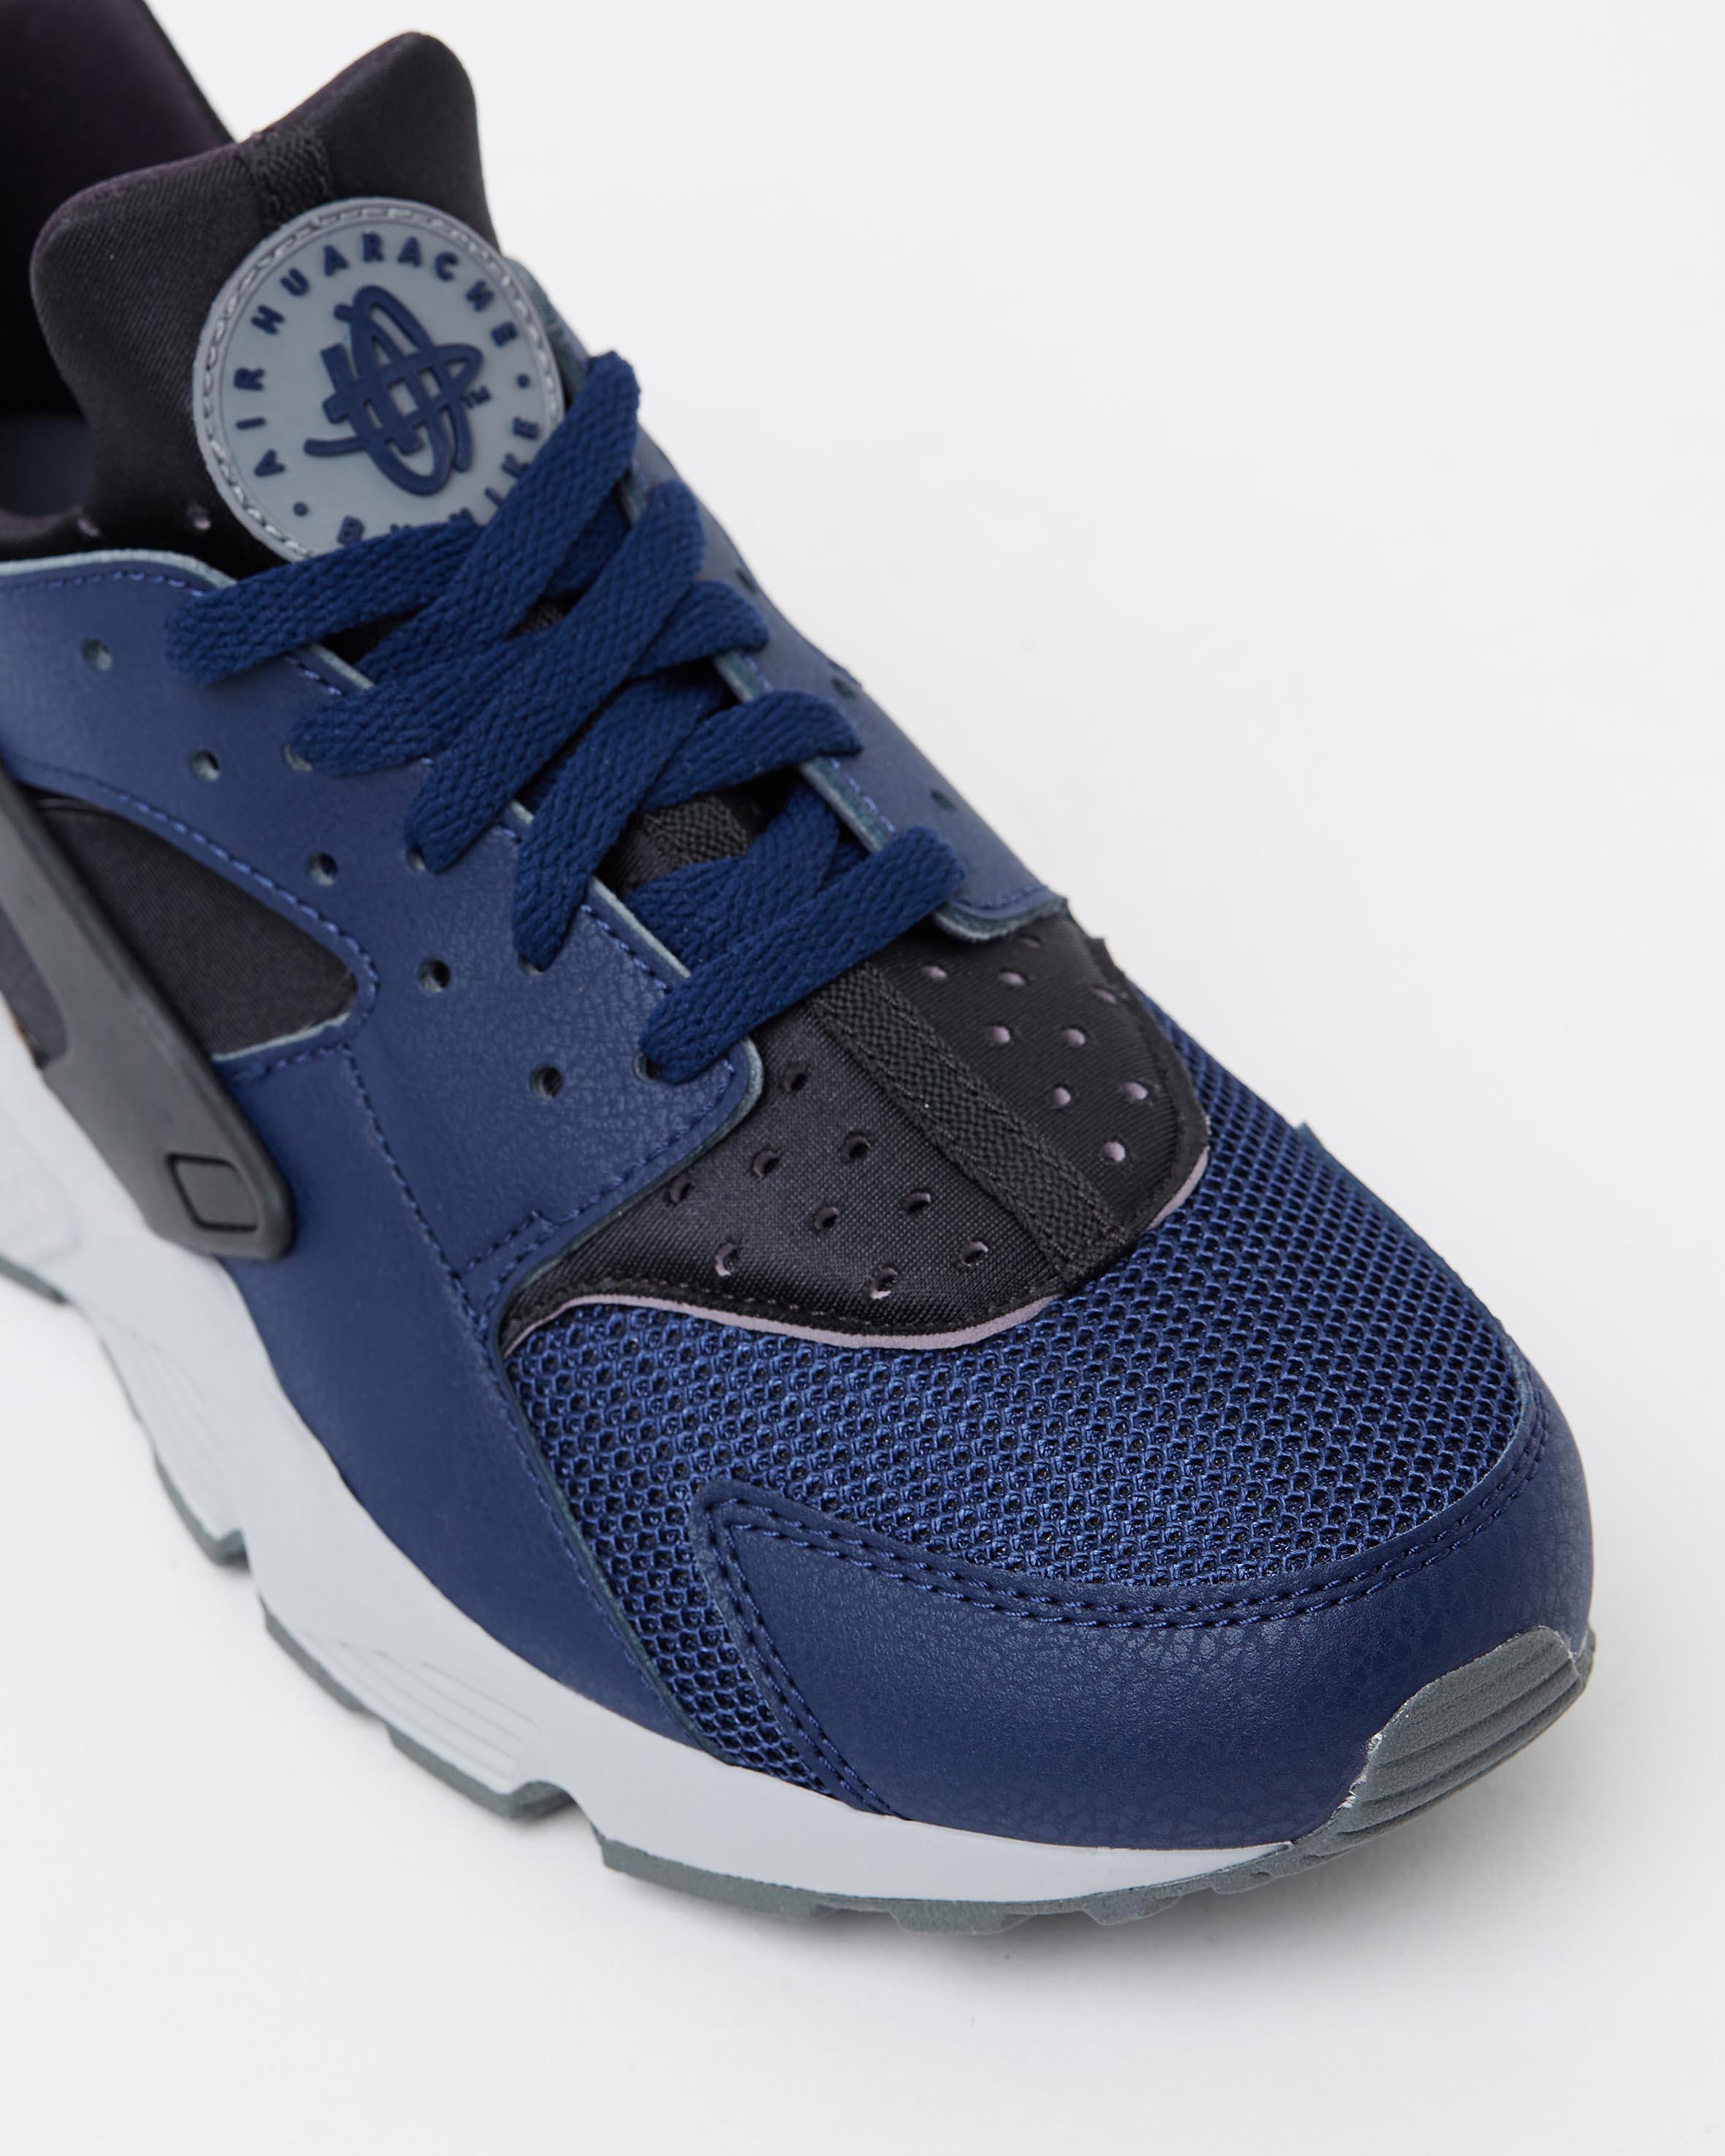 new styles aa722 de39b Nike Men's Air Huarache Mid Navy